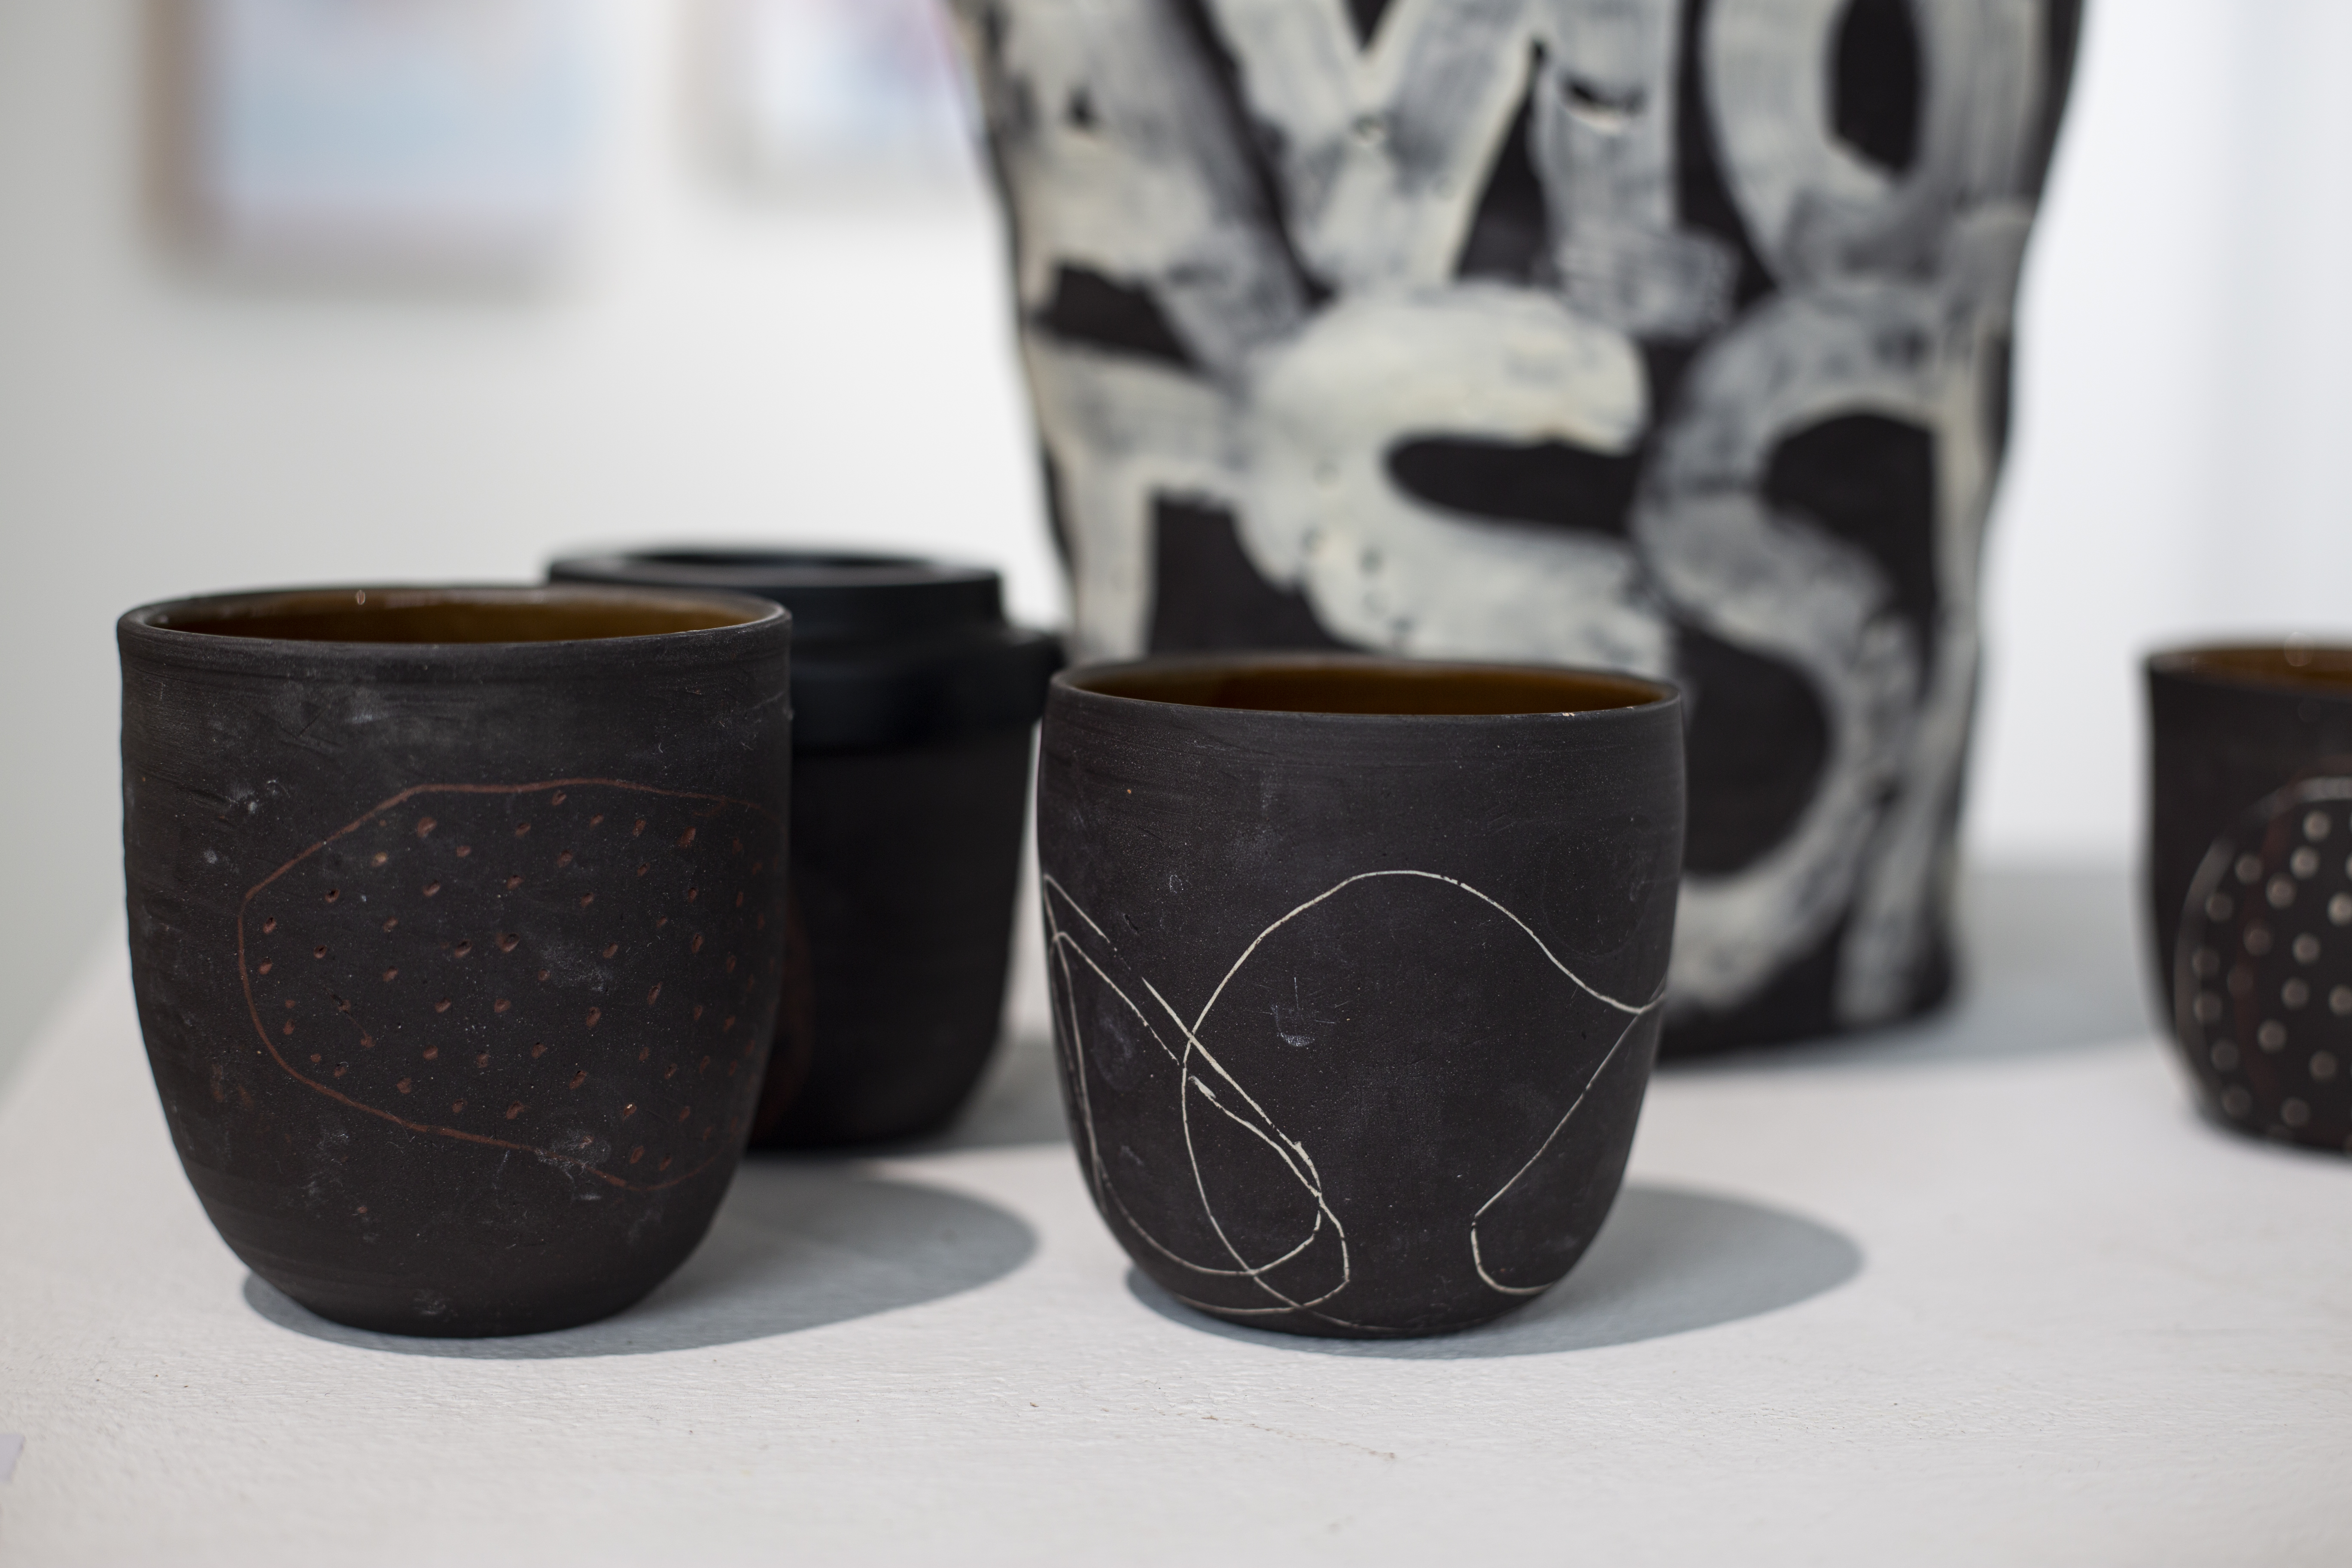 Capitalism (keep cups) by Kara Wood